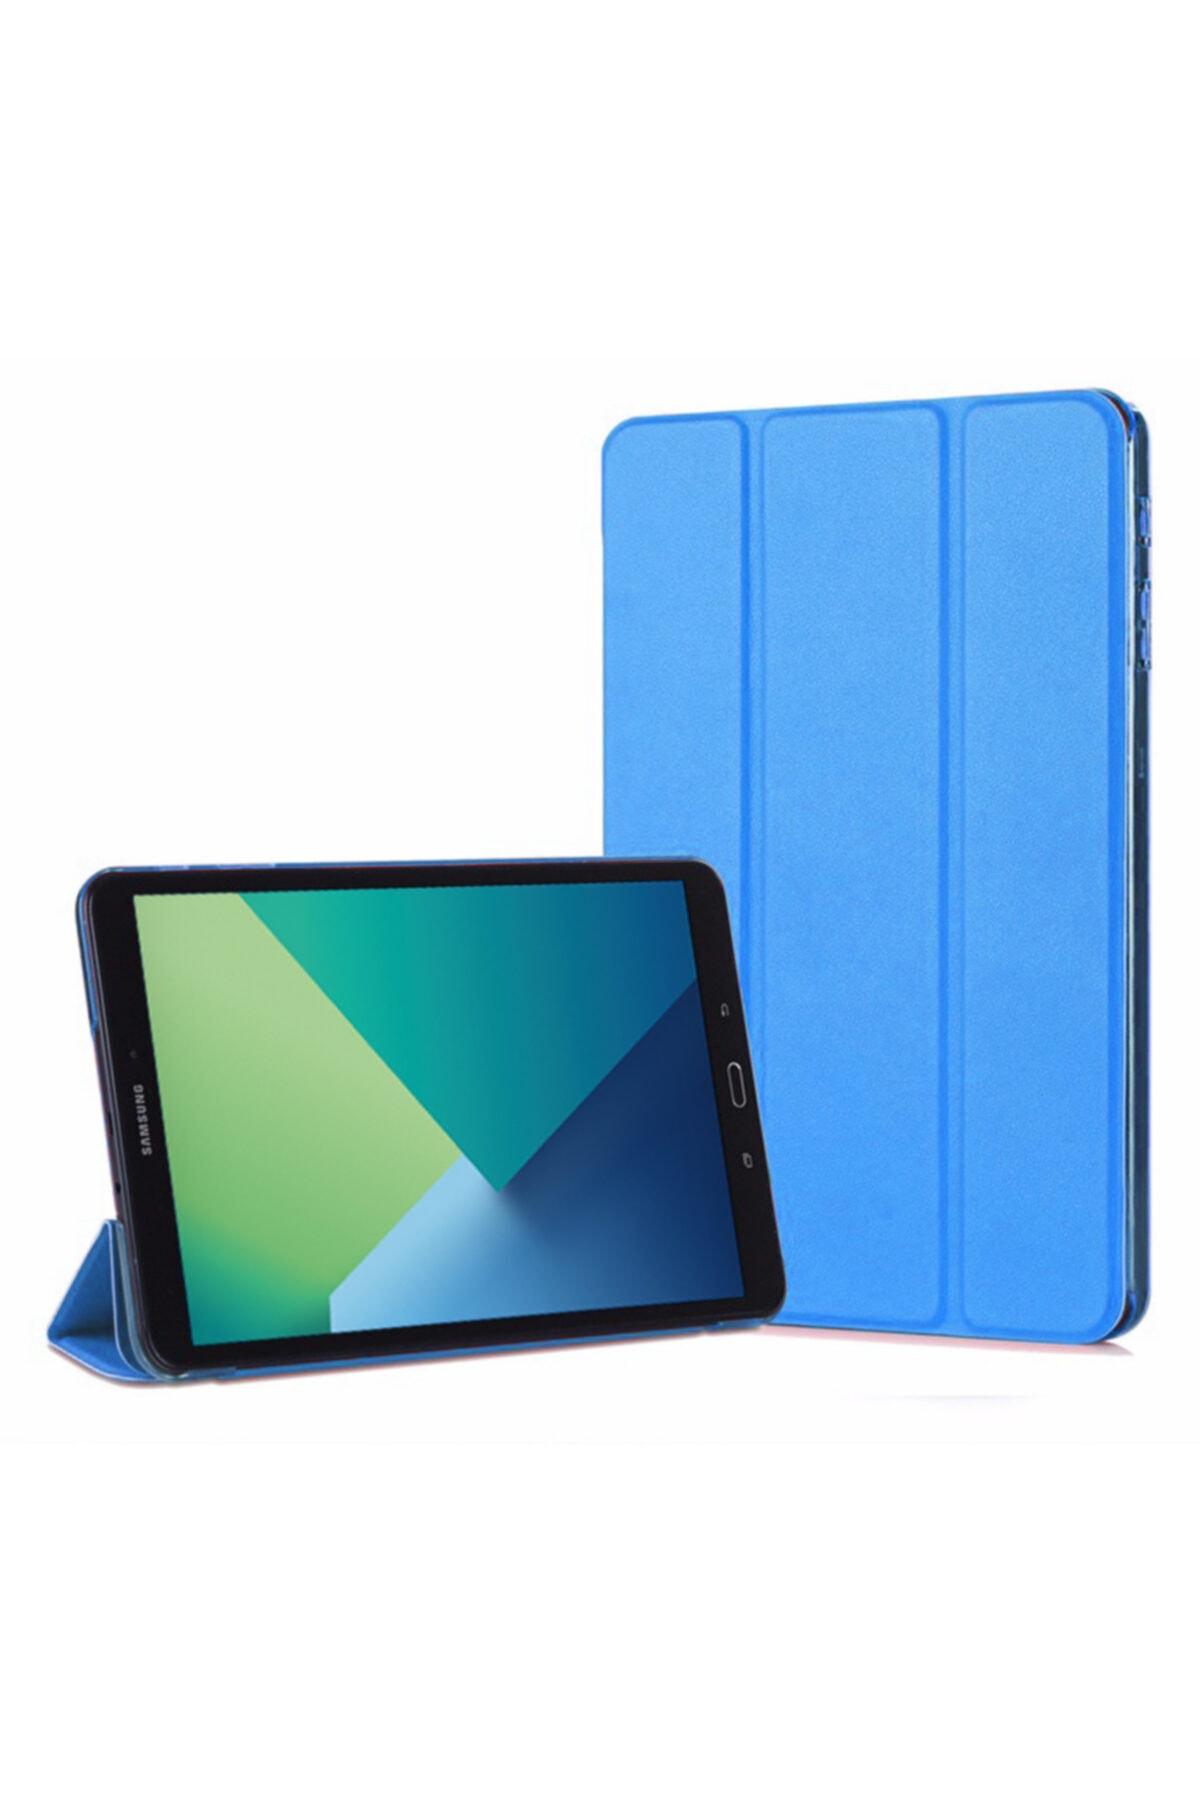 Microsonic Galaxy Tab A 10.1'' P580 Smart Case Ve Arka Kılıf, Microsonic Mavi 1